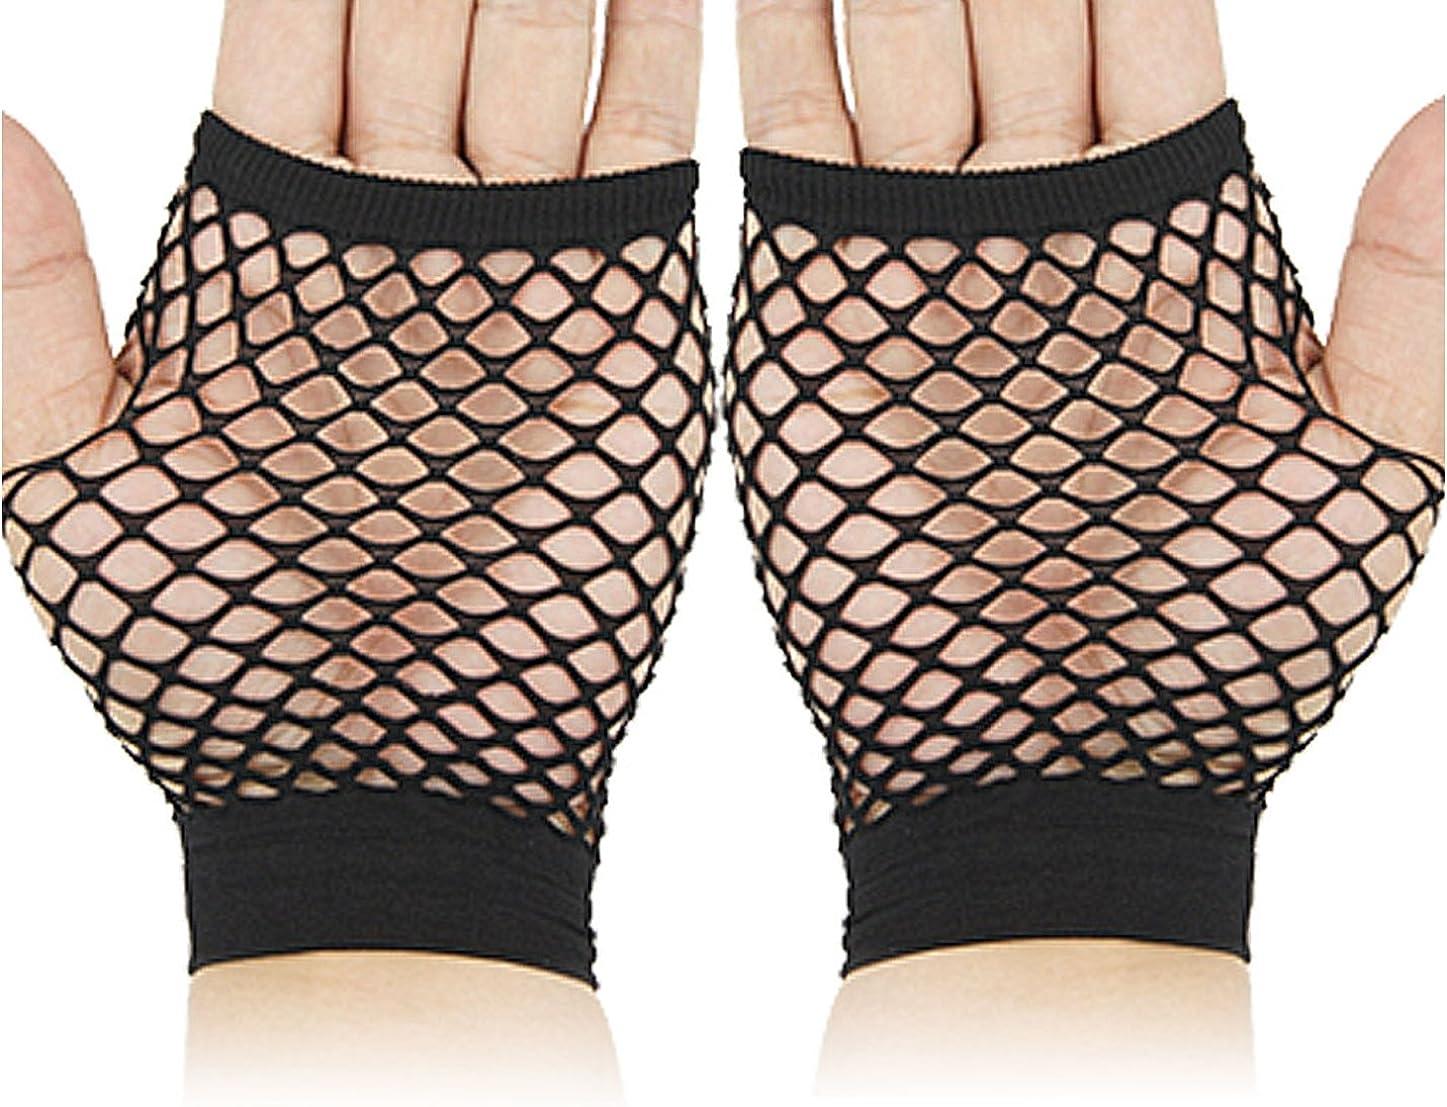 Allegra K Ladies Spandex Nylon Fish Net Short Gloves Fingerless Mittens Black M